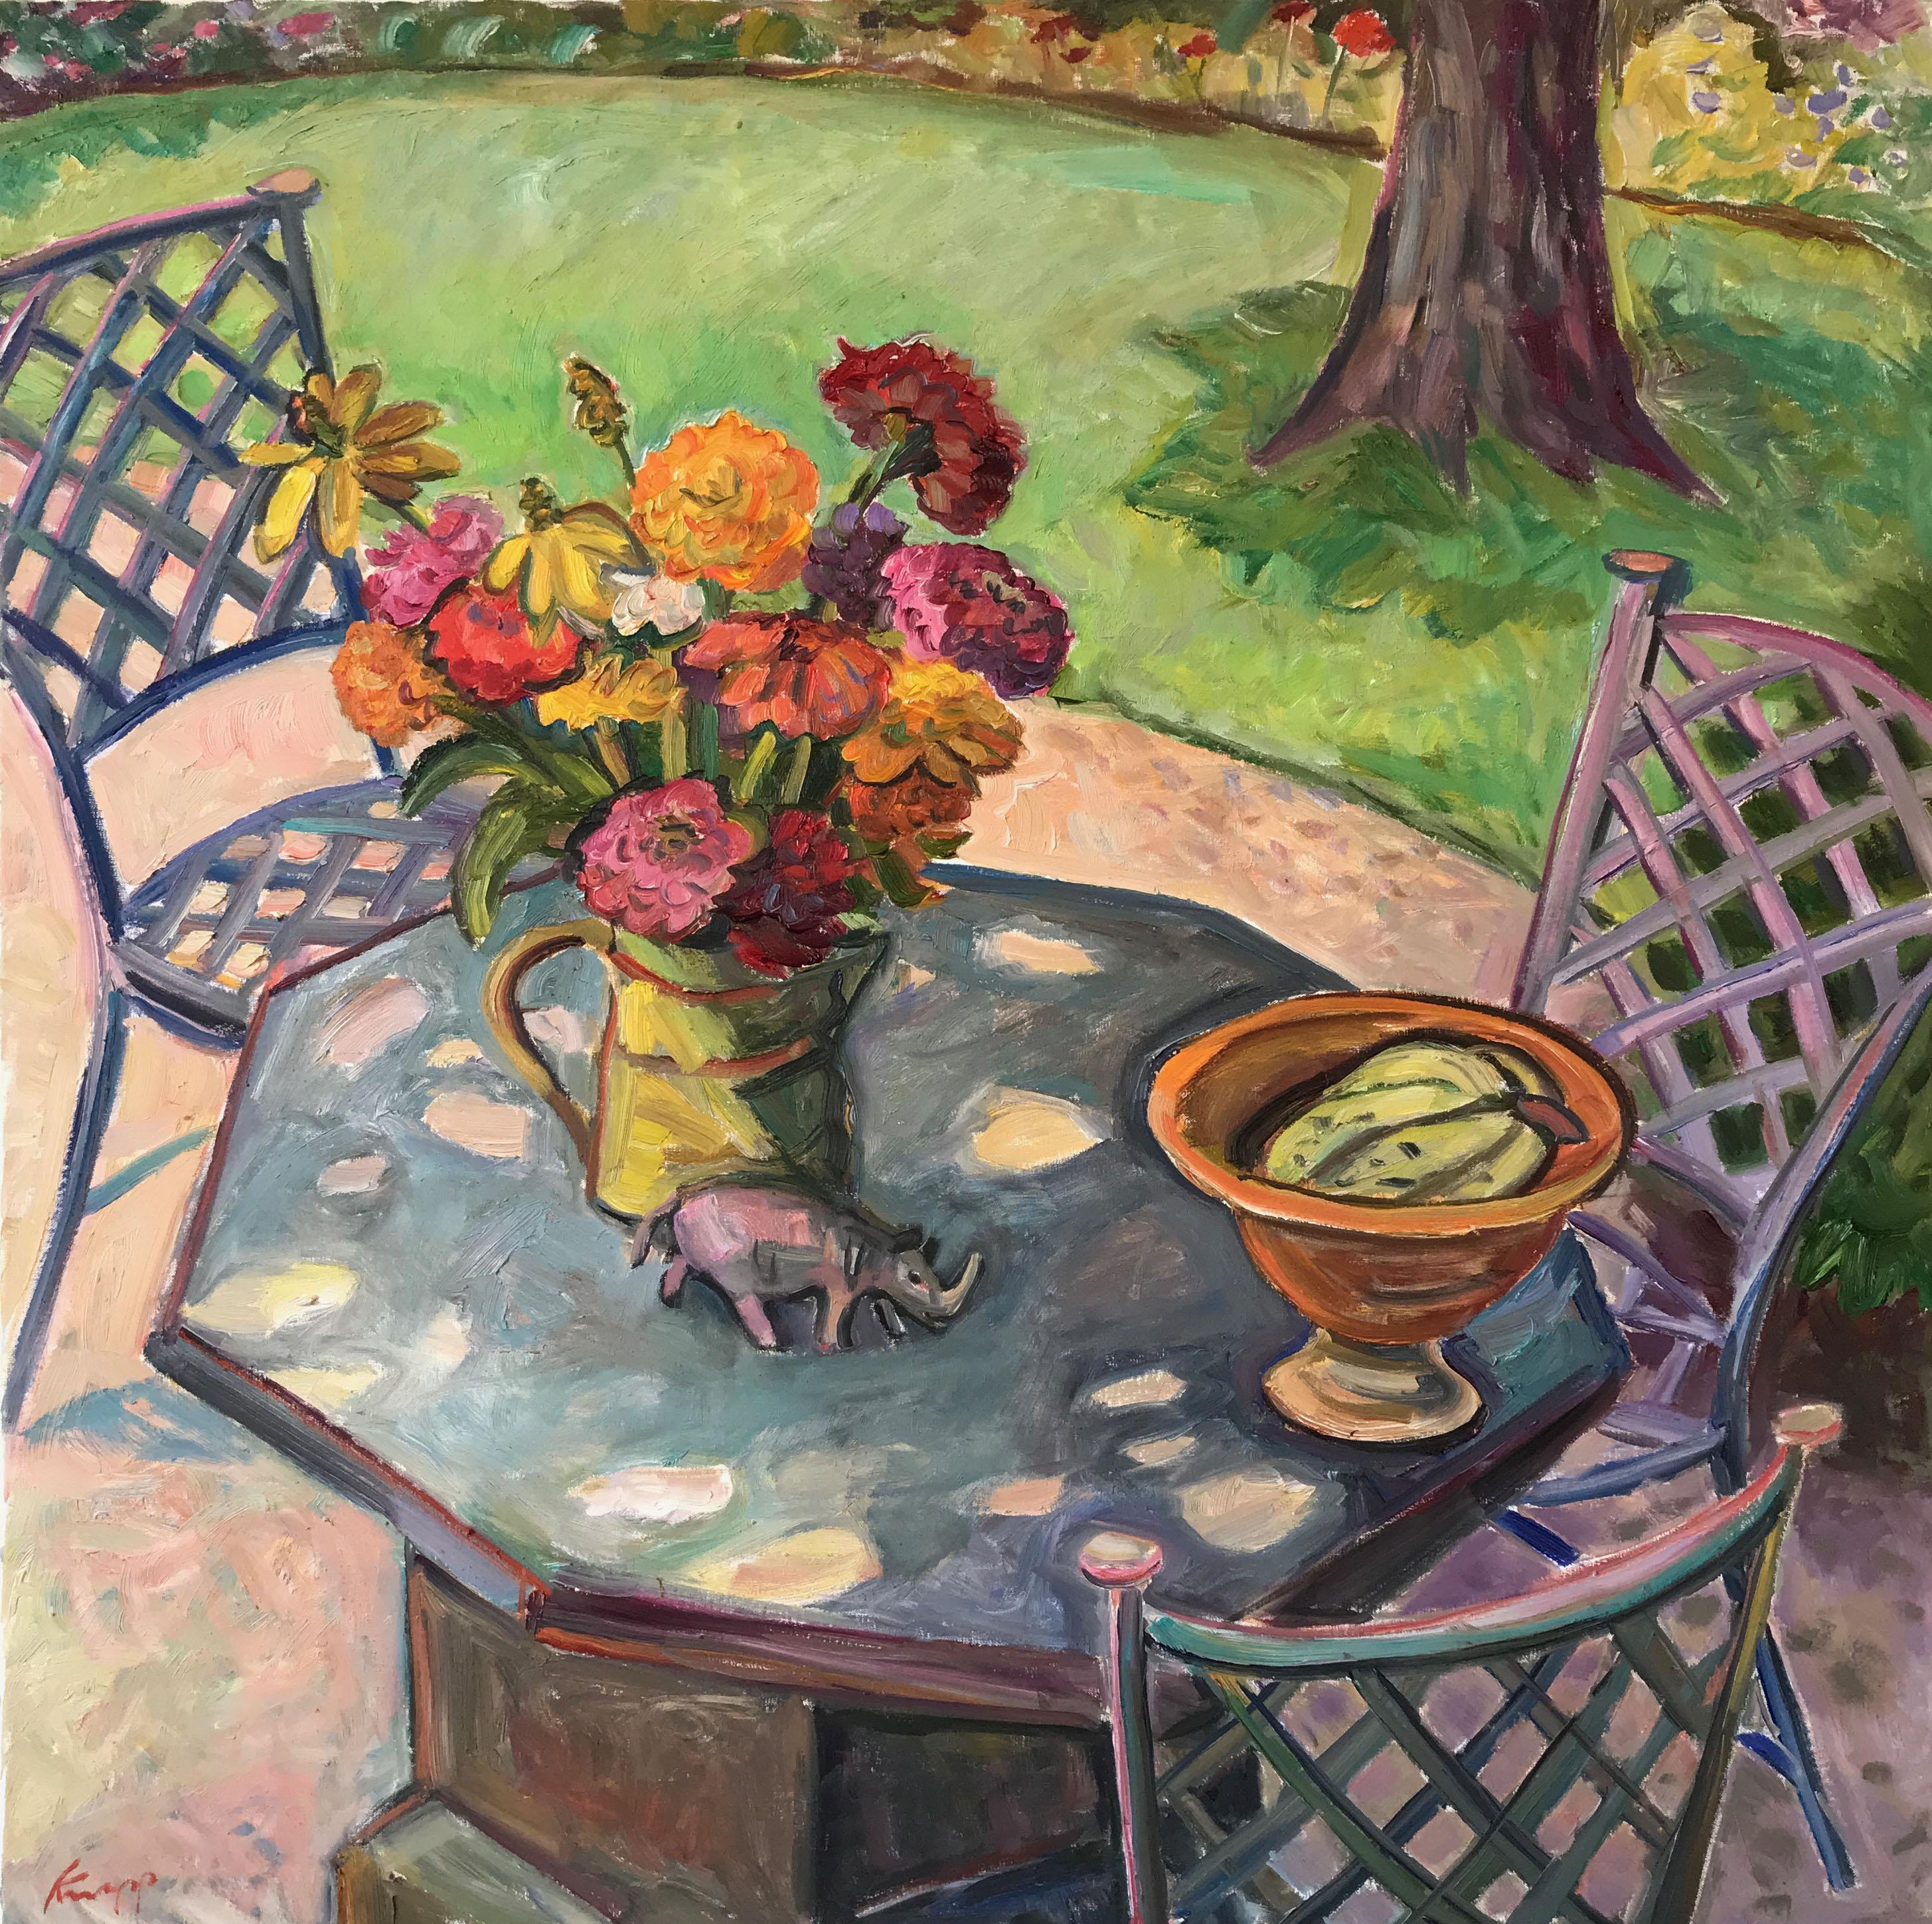 Rhinocerous on Table in Garden 36